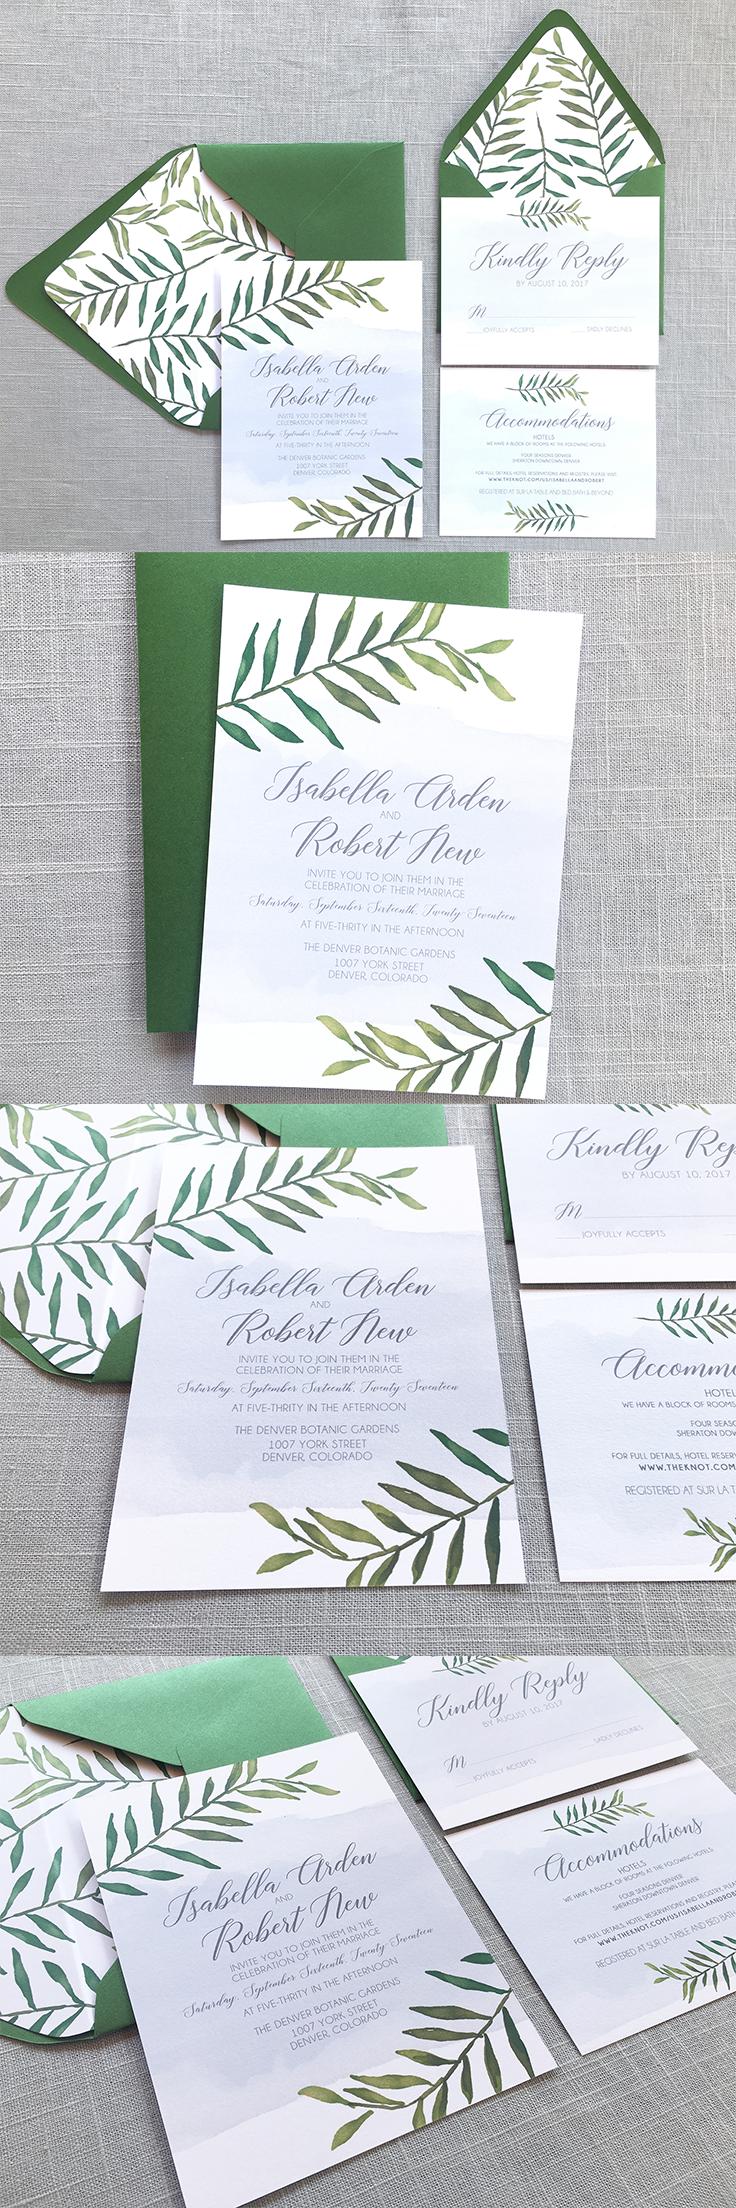 Greenery Wedding Invitations - Botanical Wedding Invitations ...